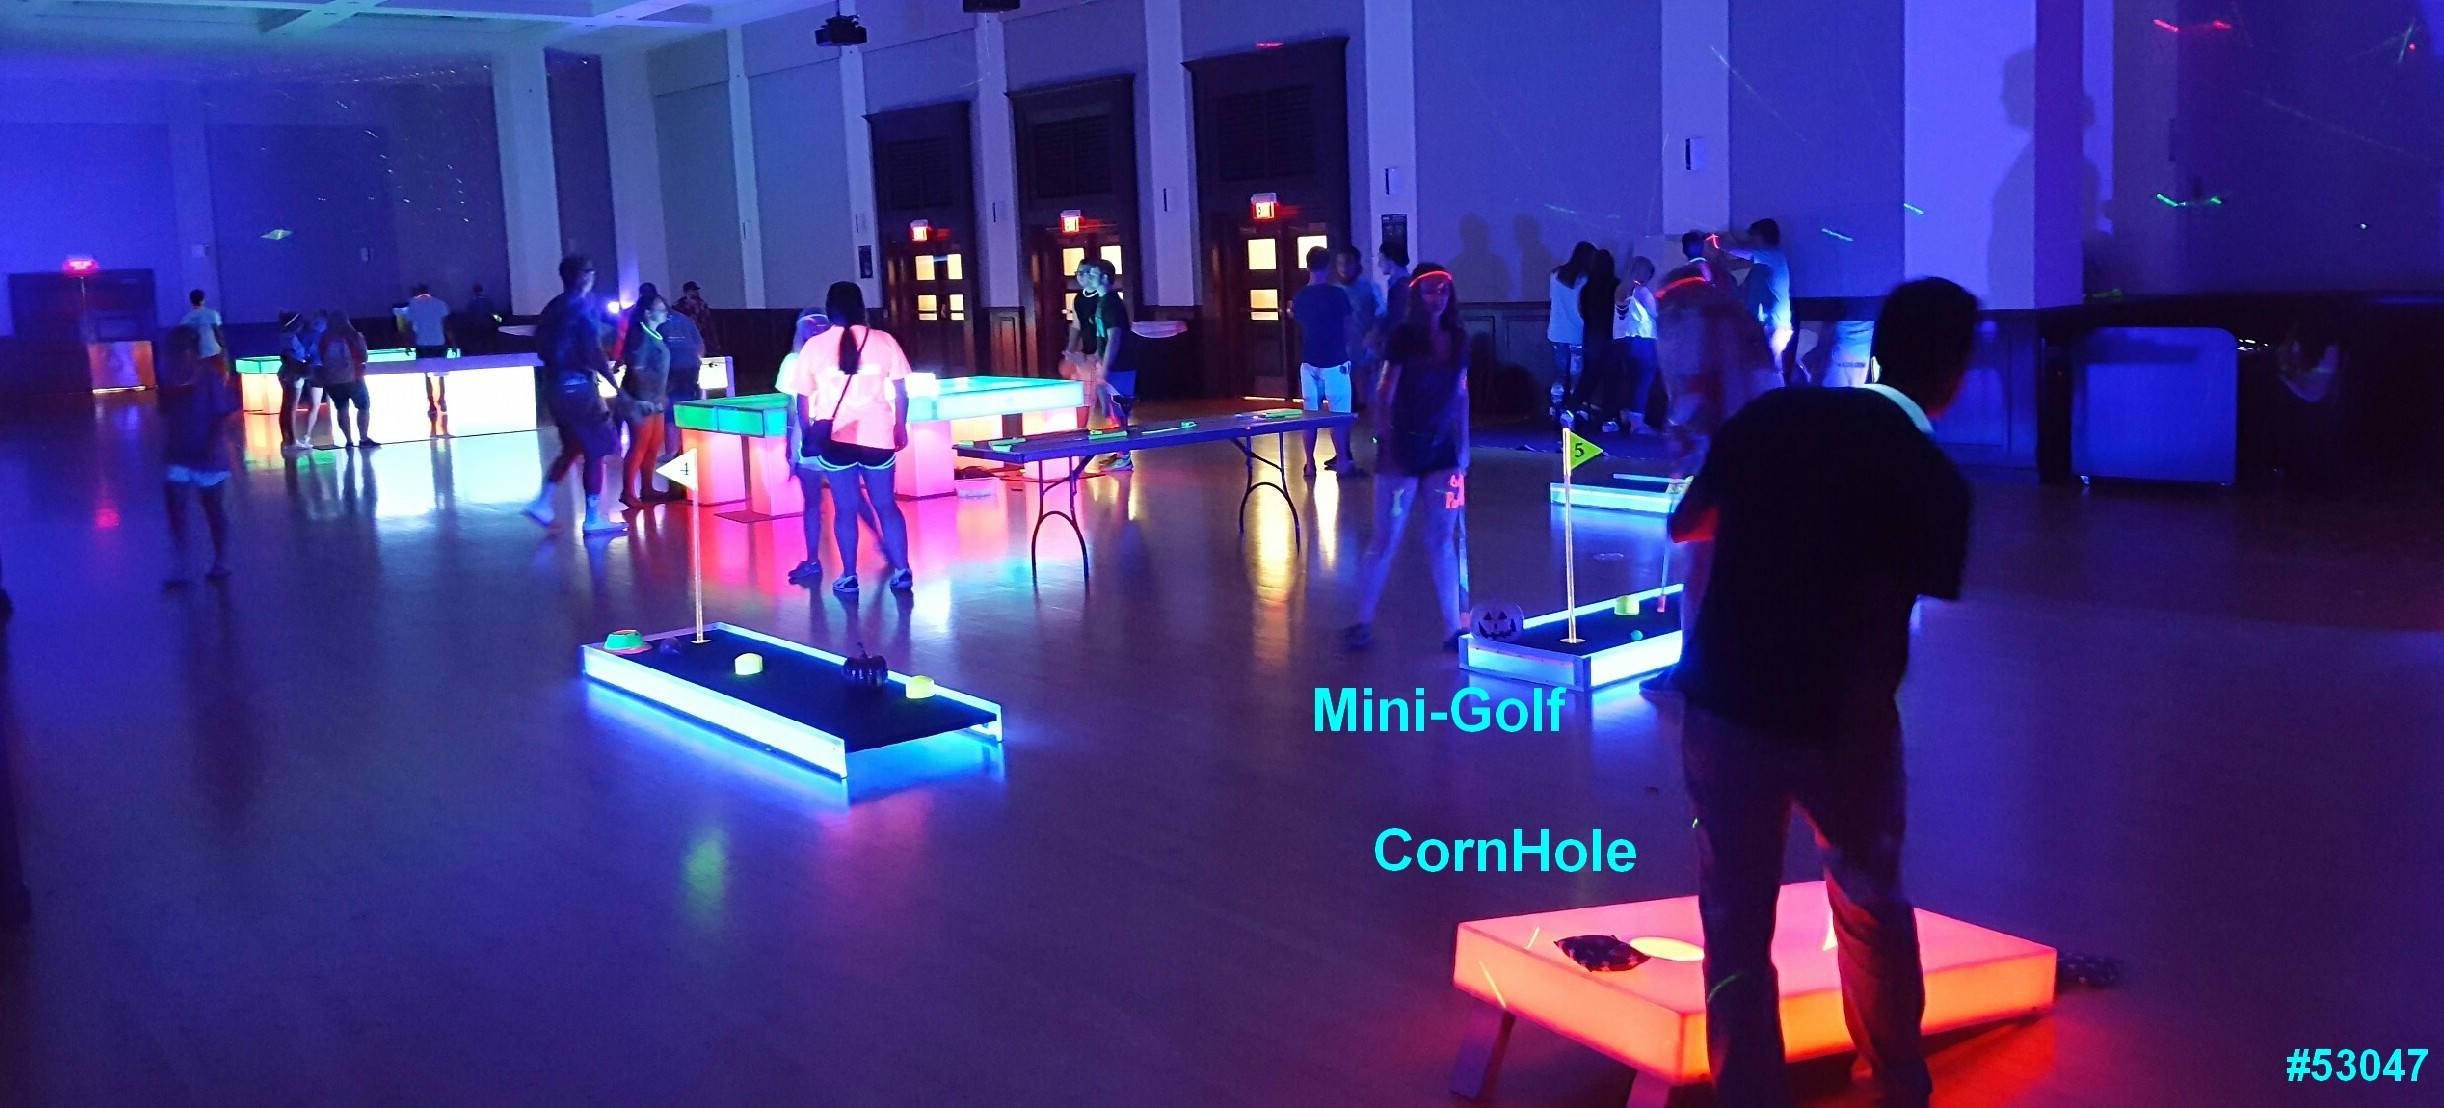 glow games cornhole mini golf glow in the dark rentals